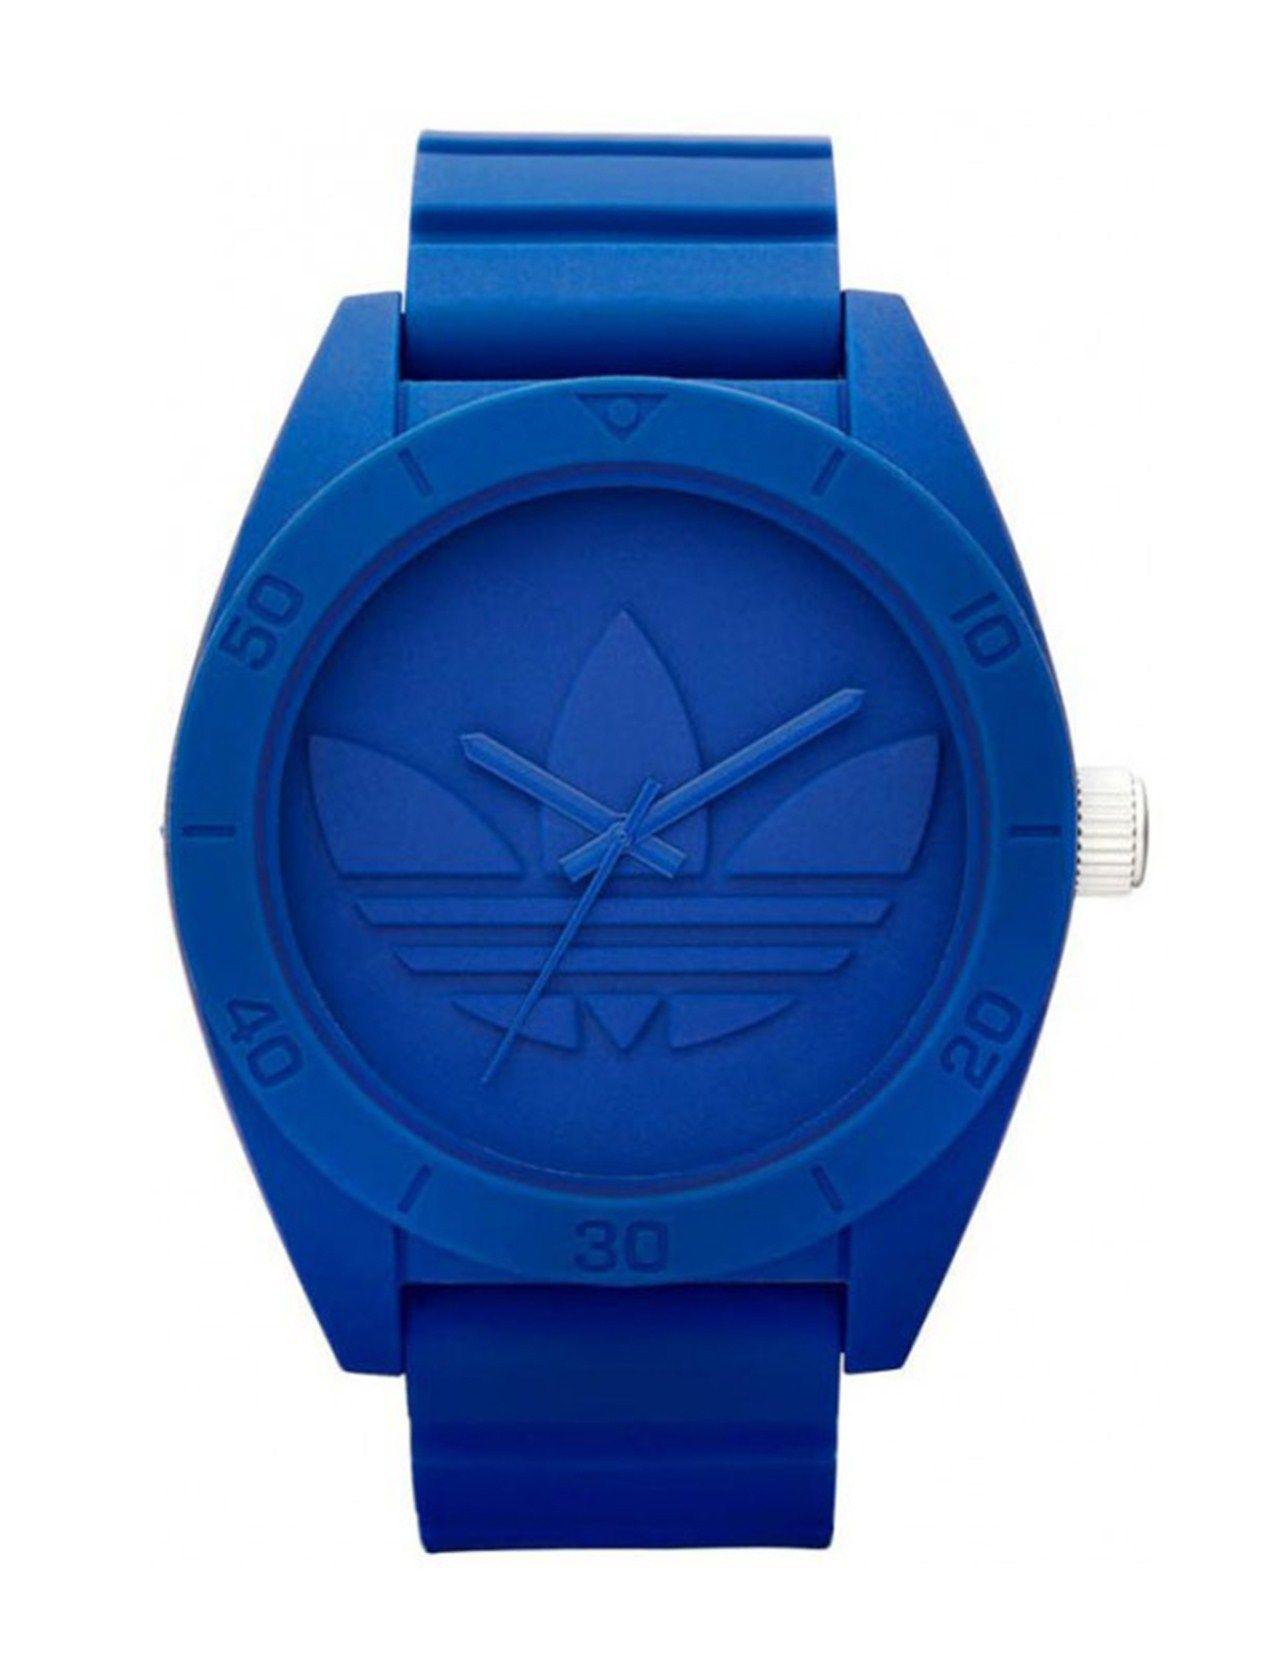 Adidas Mavii Alinacak Seyler Adidas Watch Adidas Ve Adidas Originals